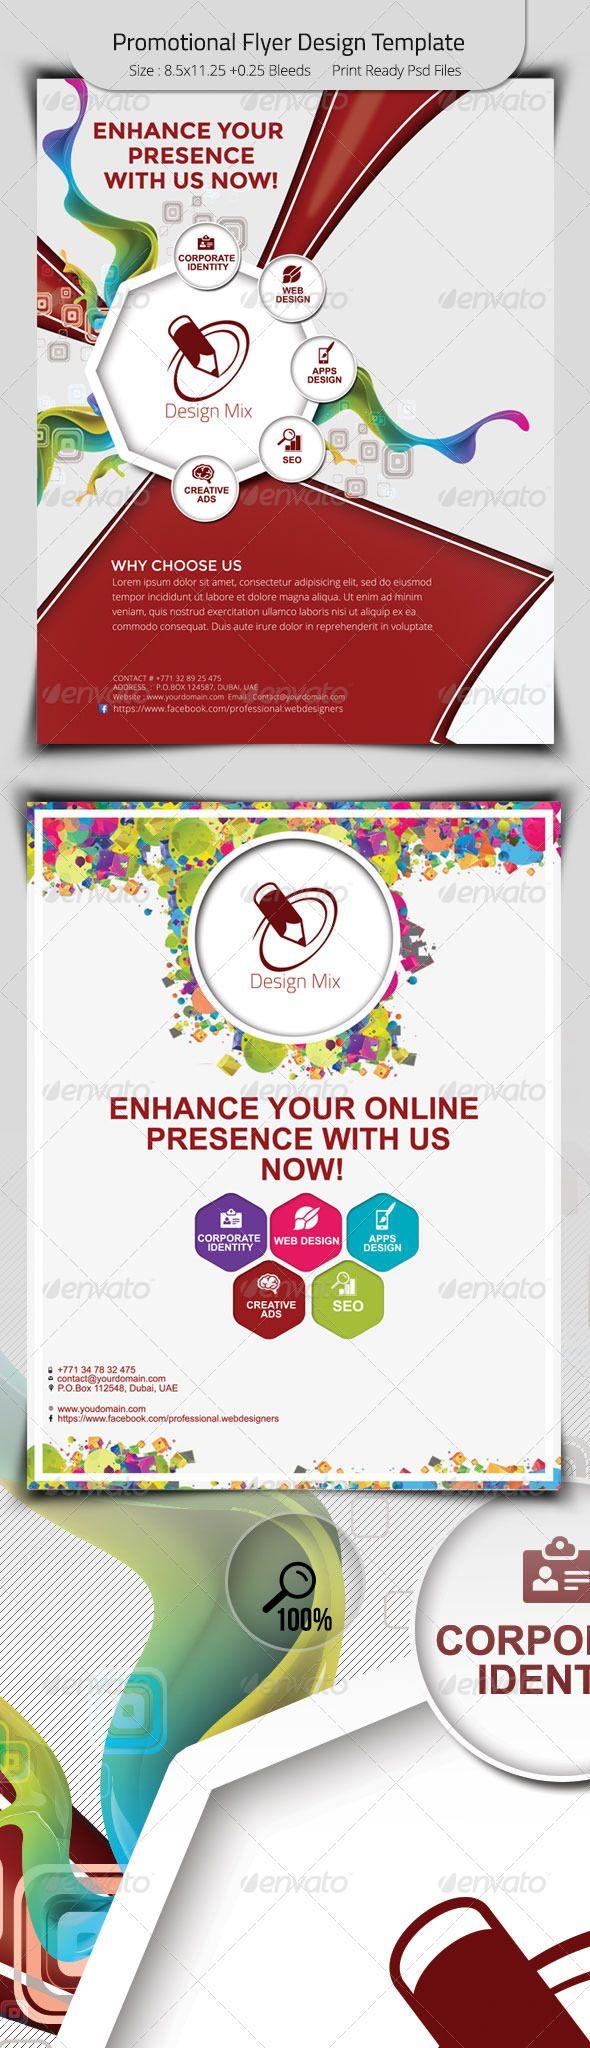 best ideas about promotional flyers food menu promotional flyer design template